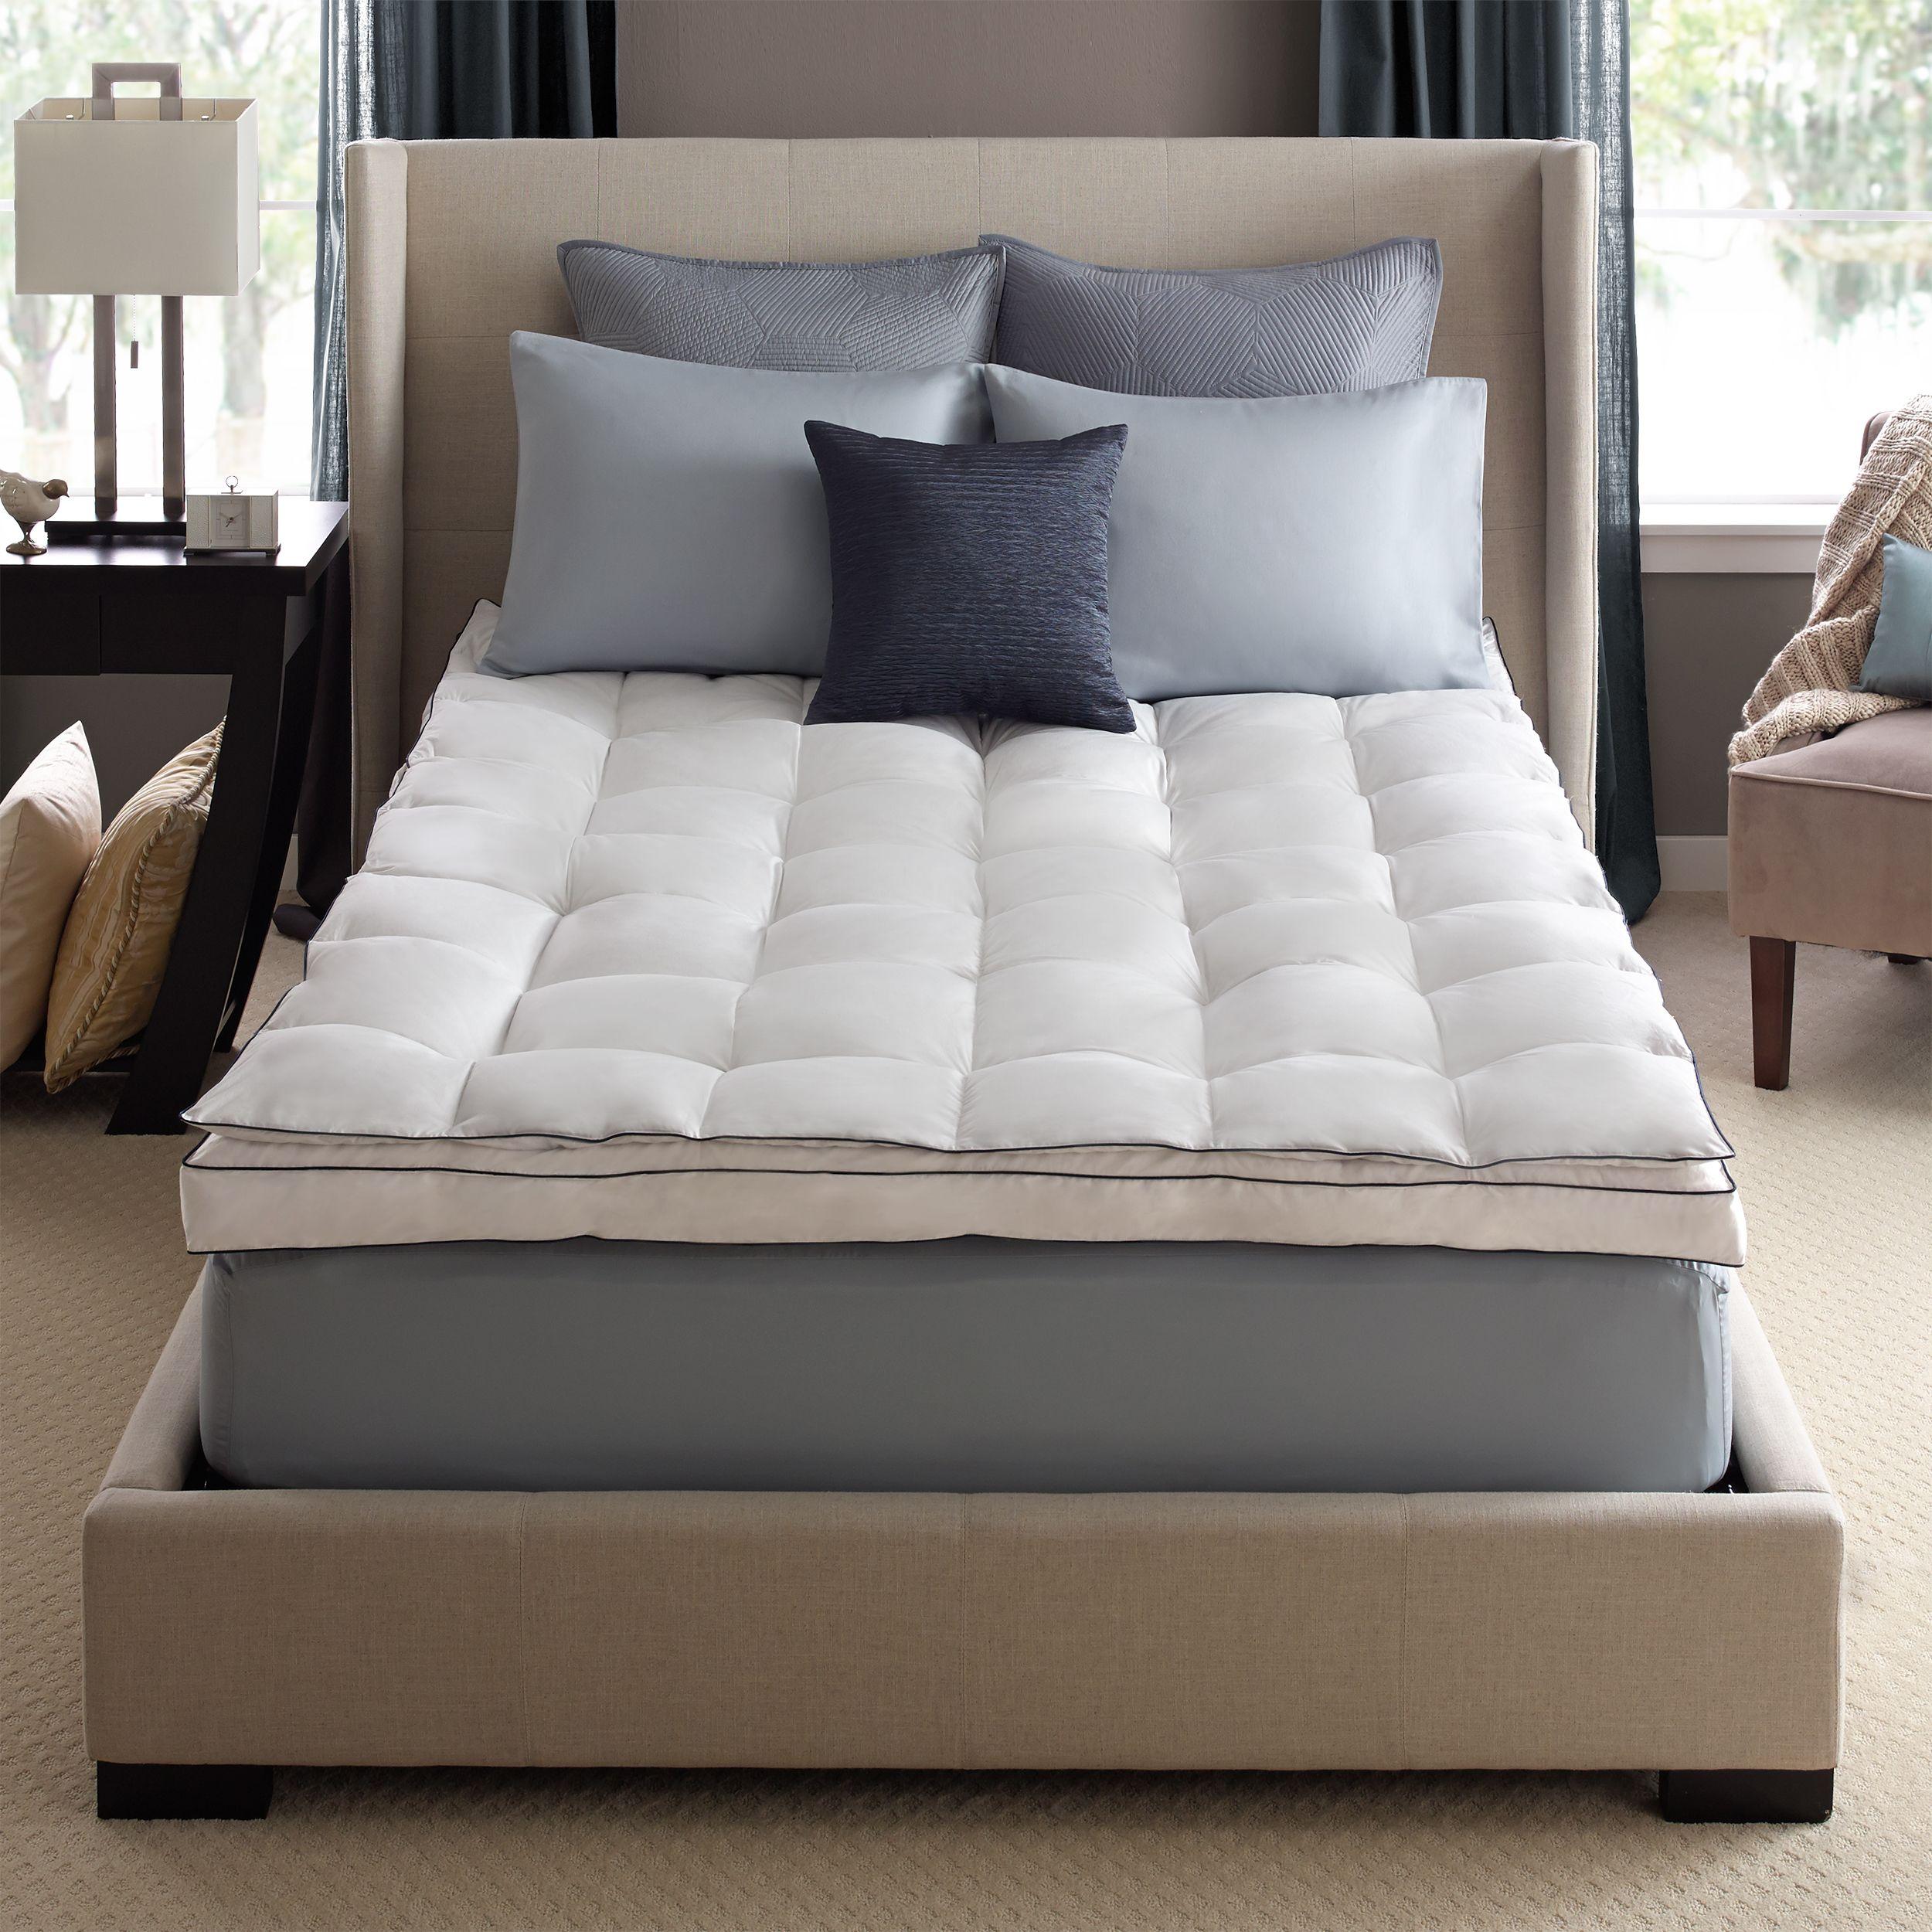 Deluxe Oversized Comforter Twin Mattress topper